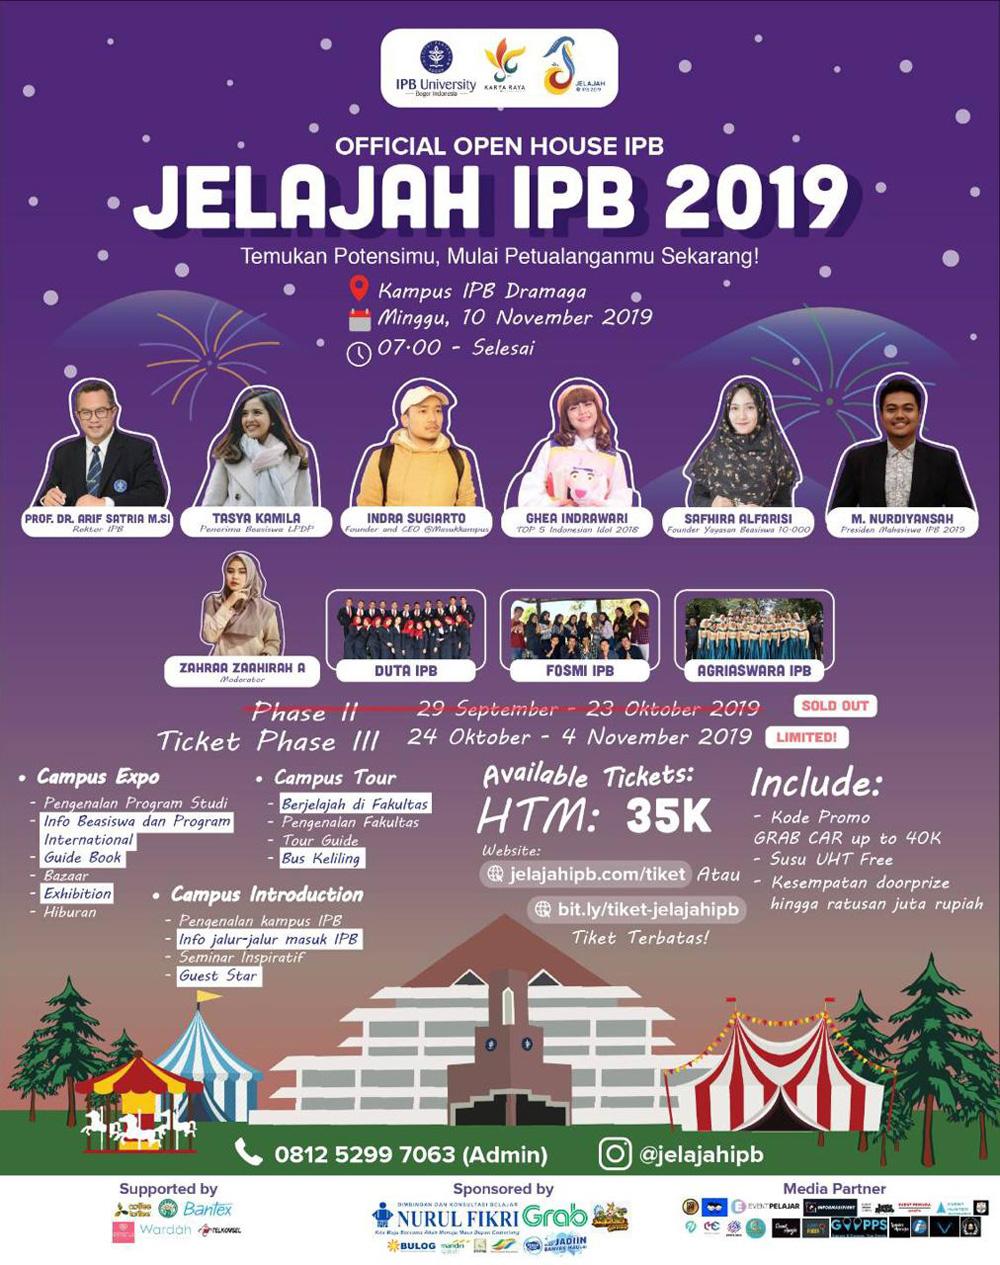 Jelajah IPB 2019